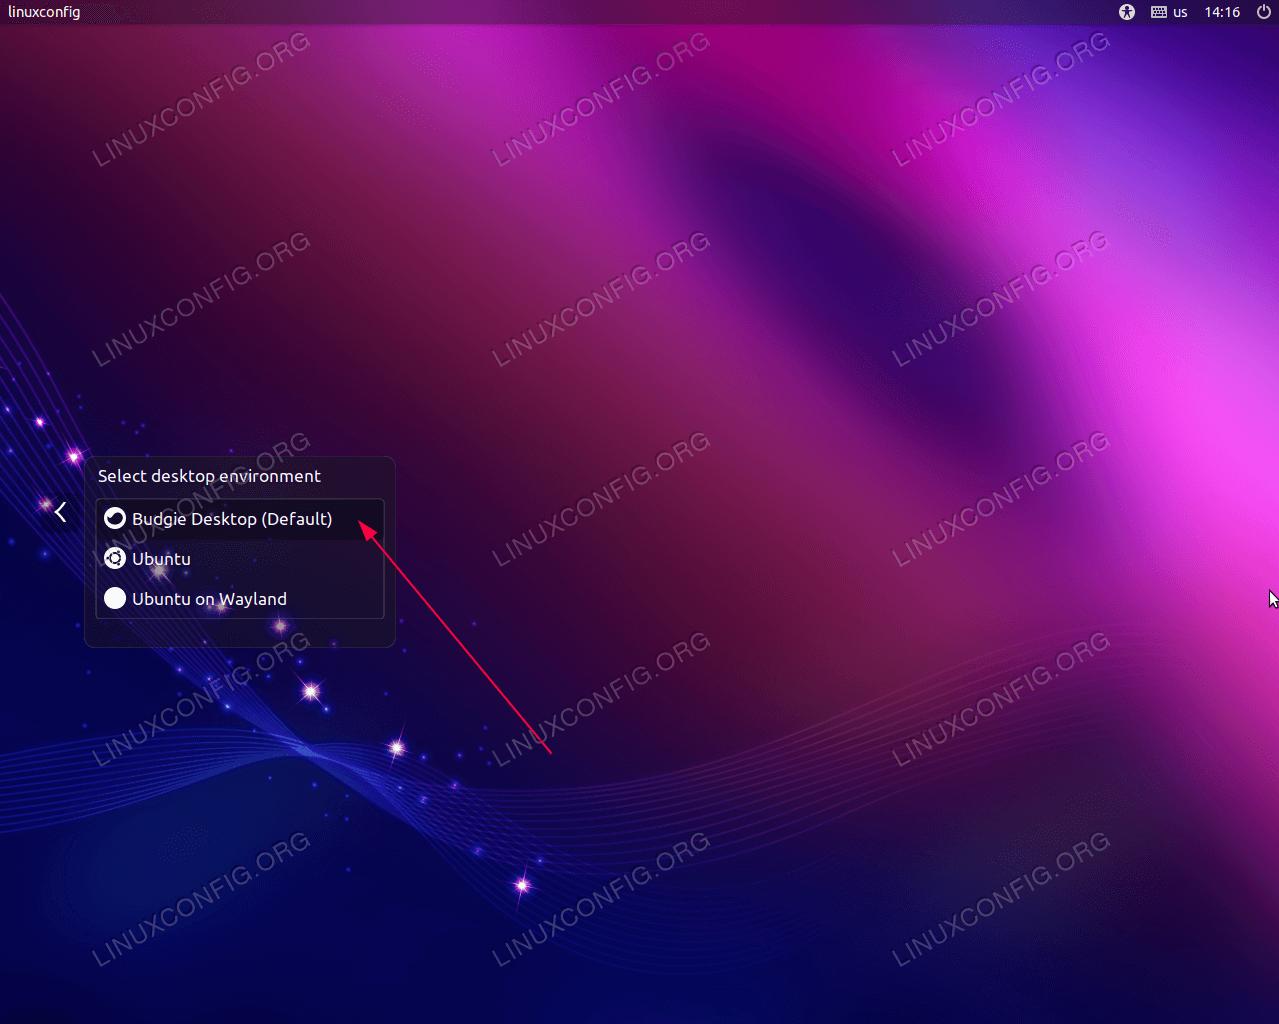 Select Budgie Desktop, enter your password and hit login button